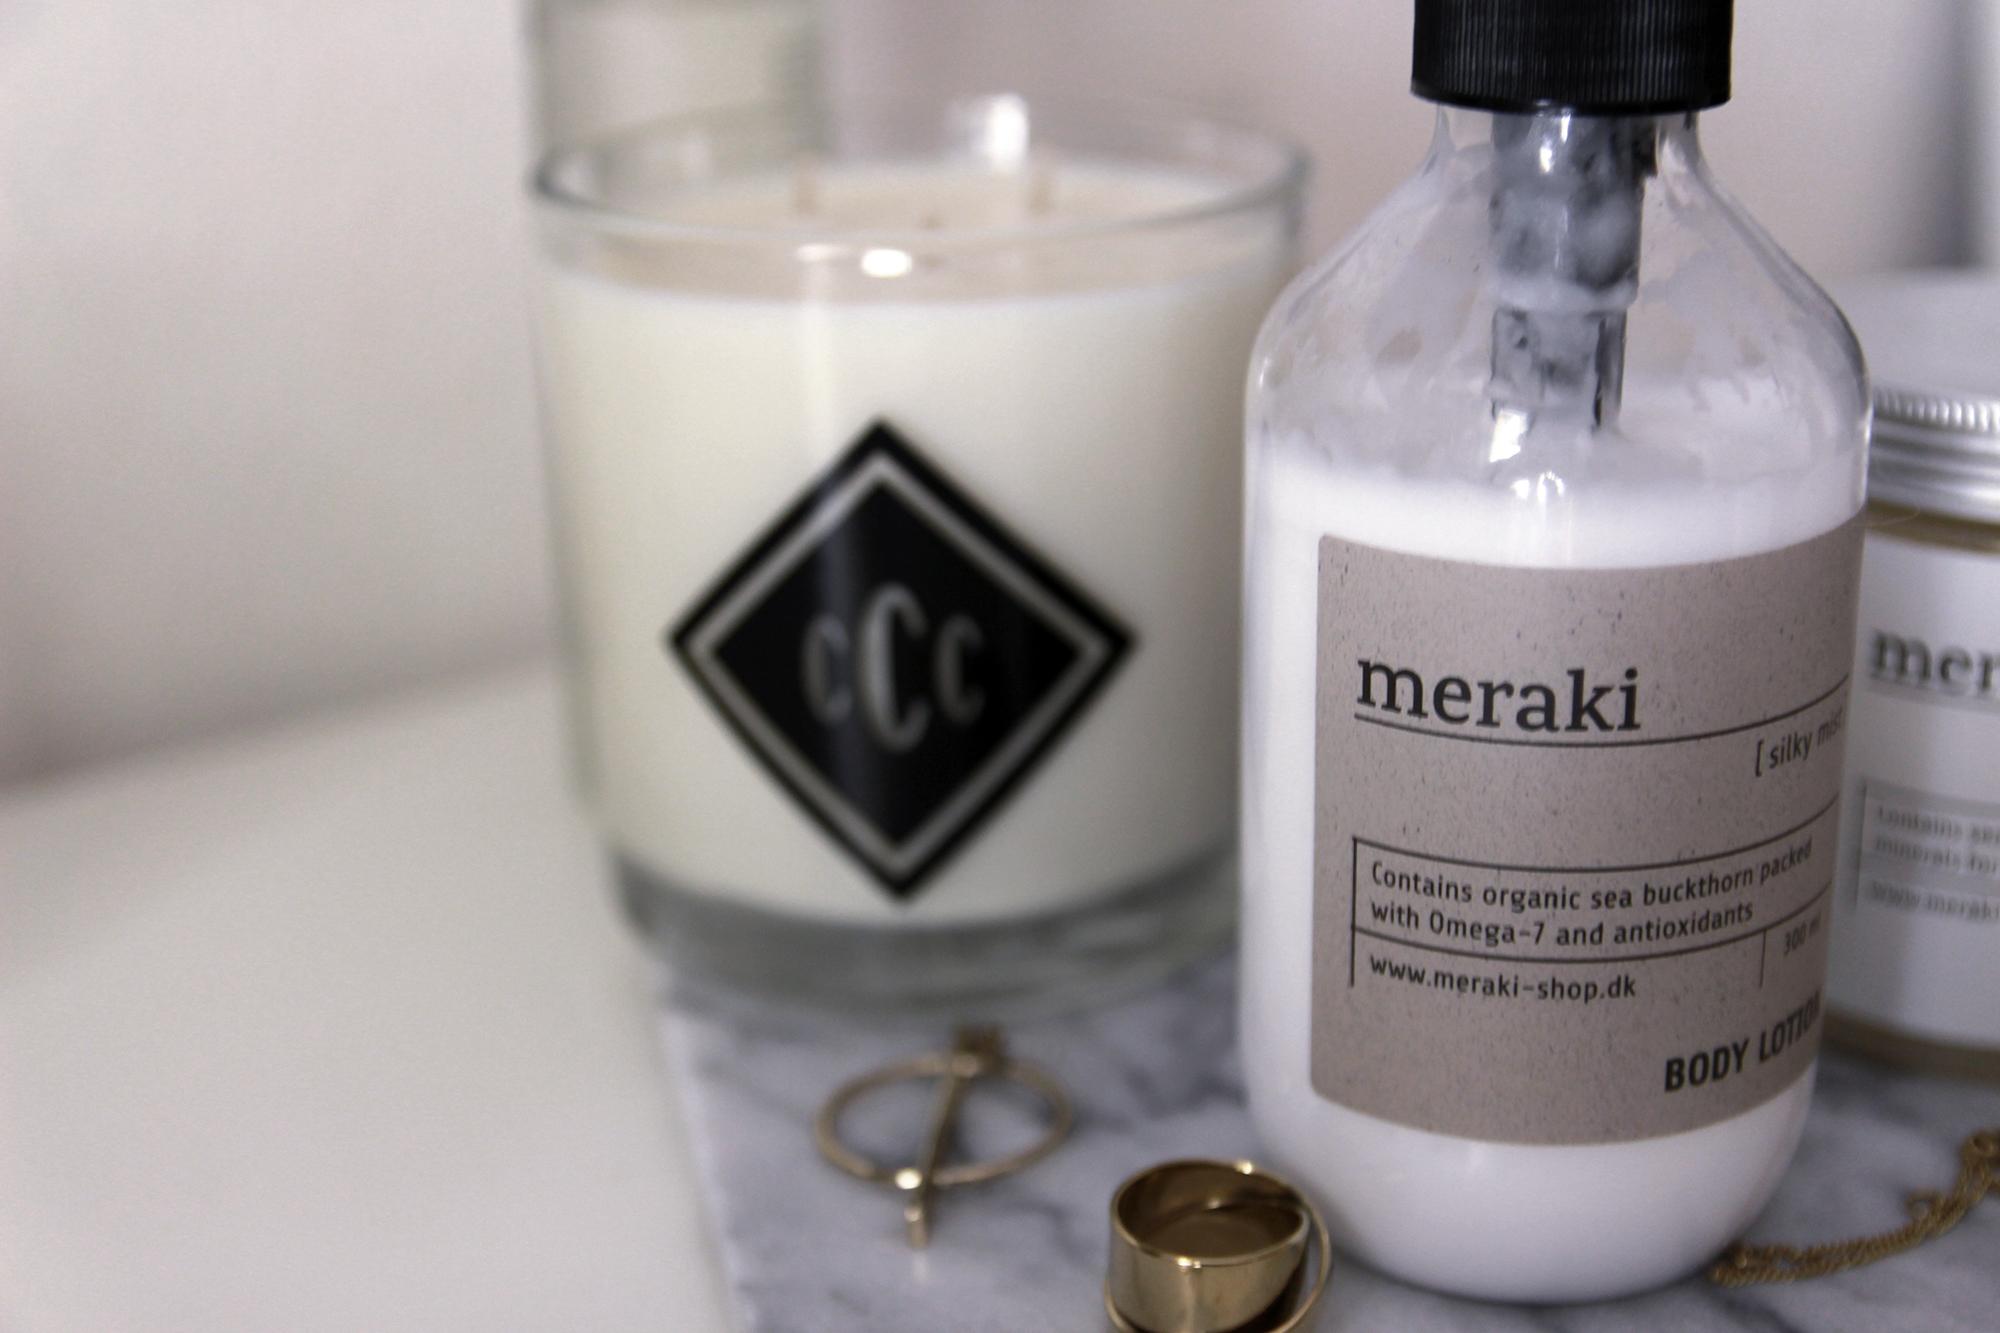 meraki-silky-mist-body-lotion